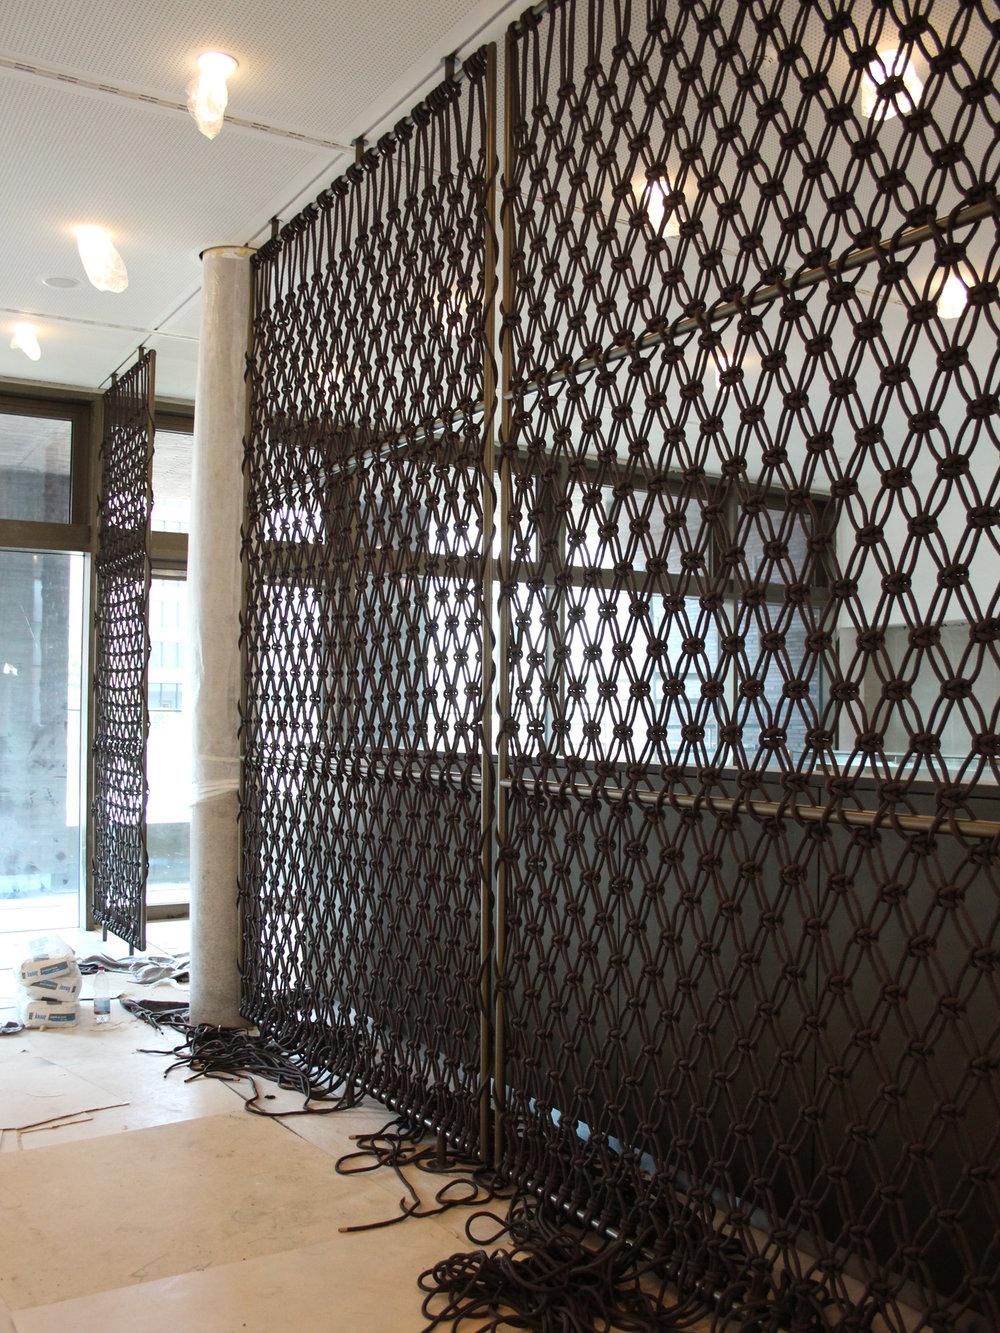 Aufbau Makrame Sichtschutz im Neubau Marquard & Bahls in Hamburg